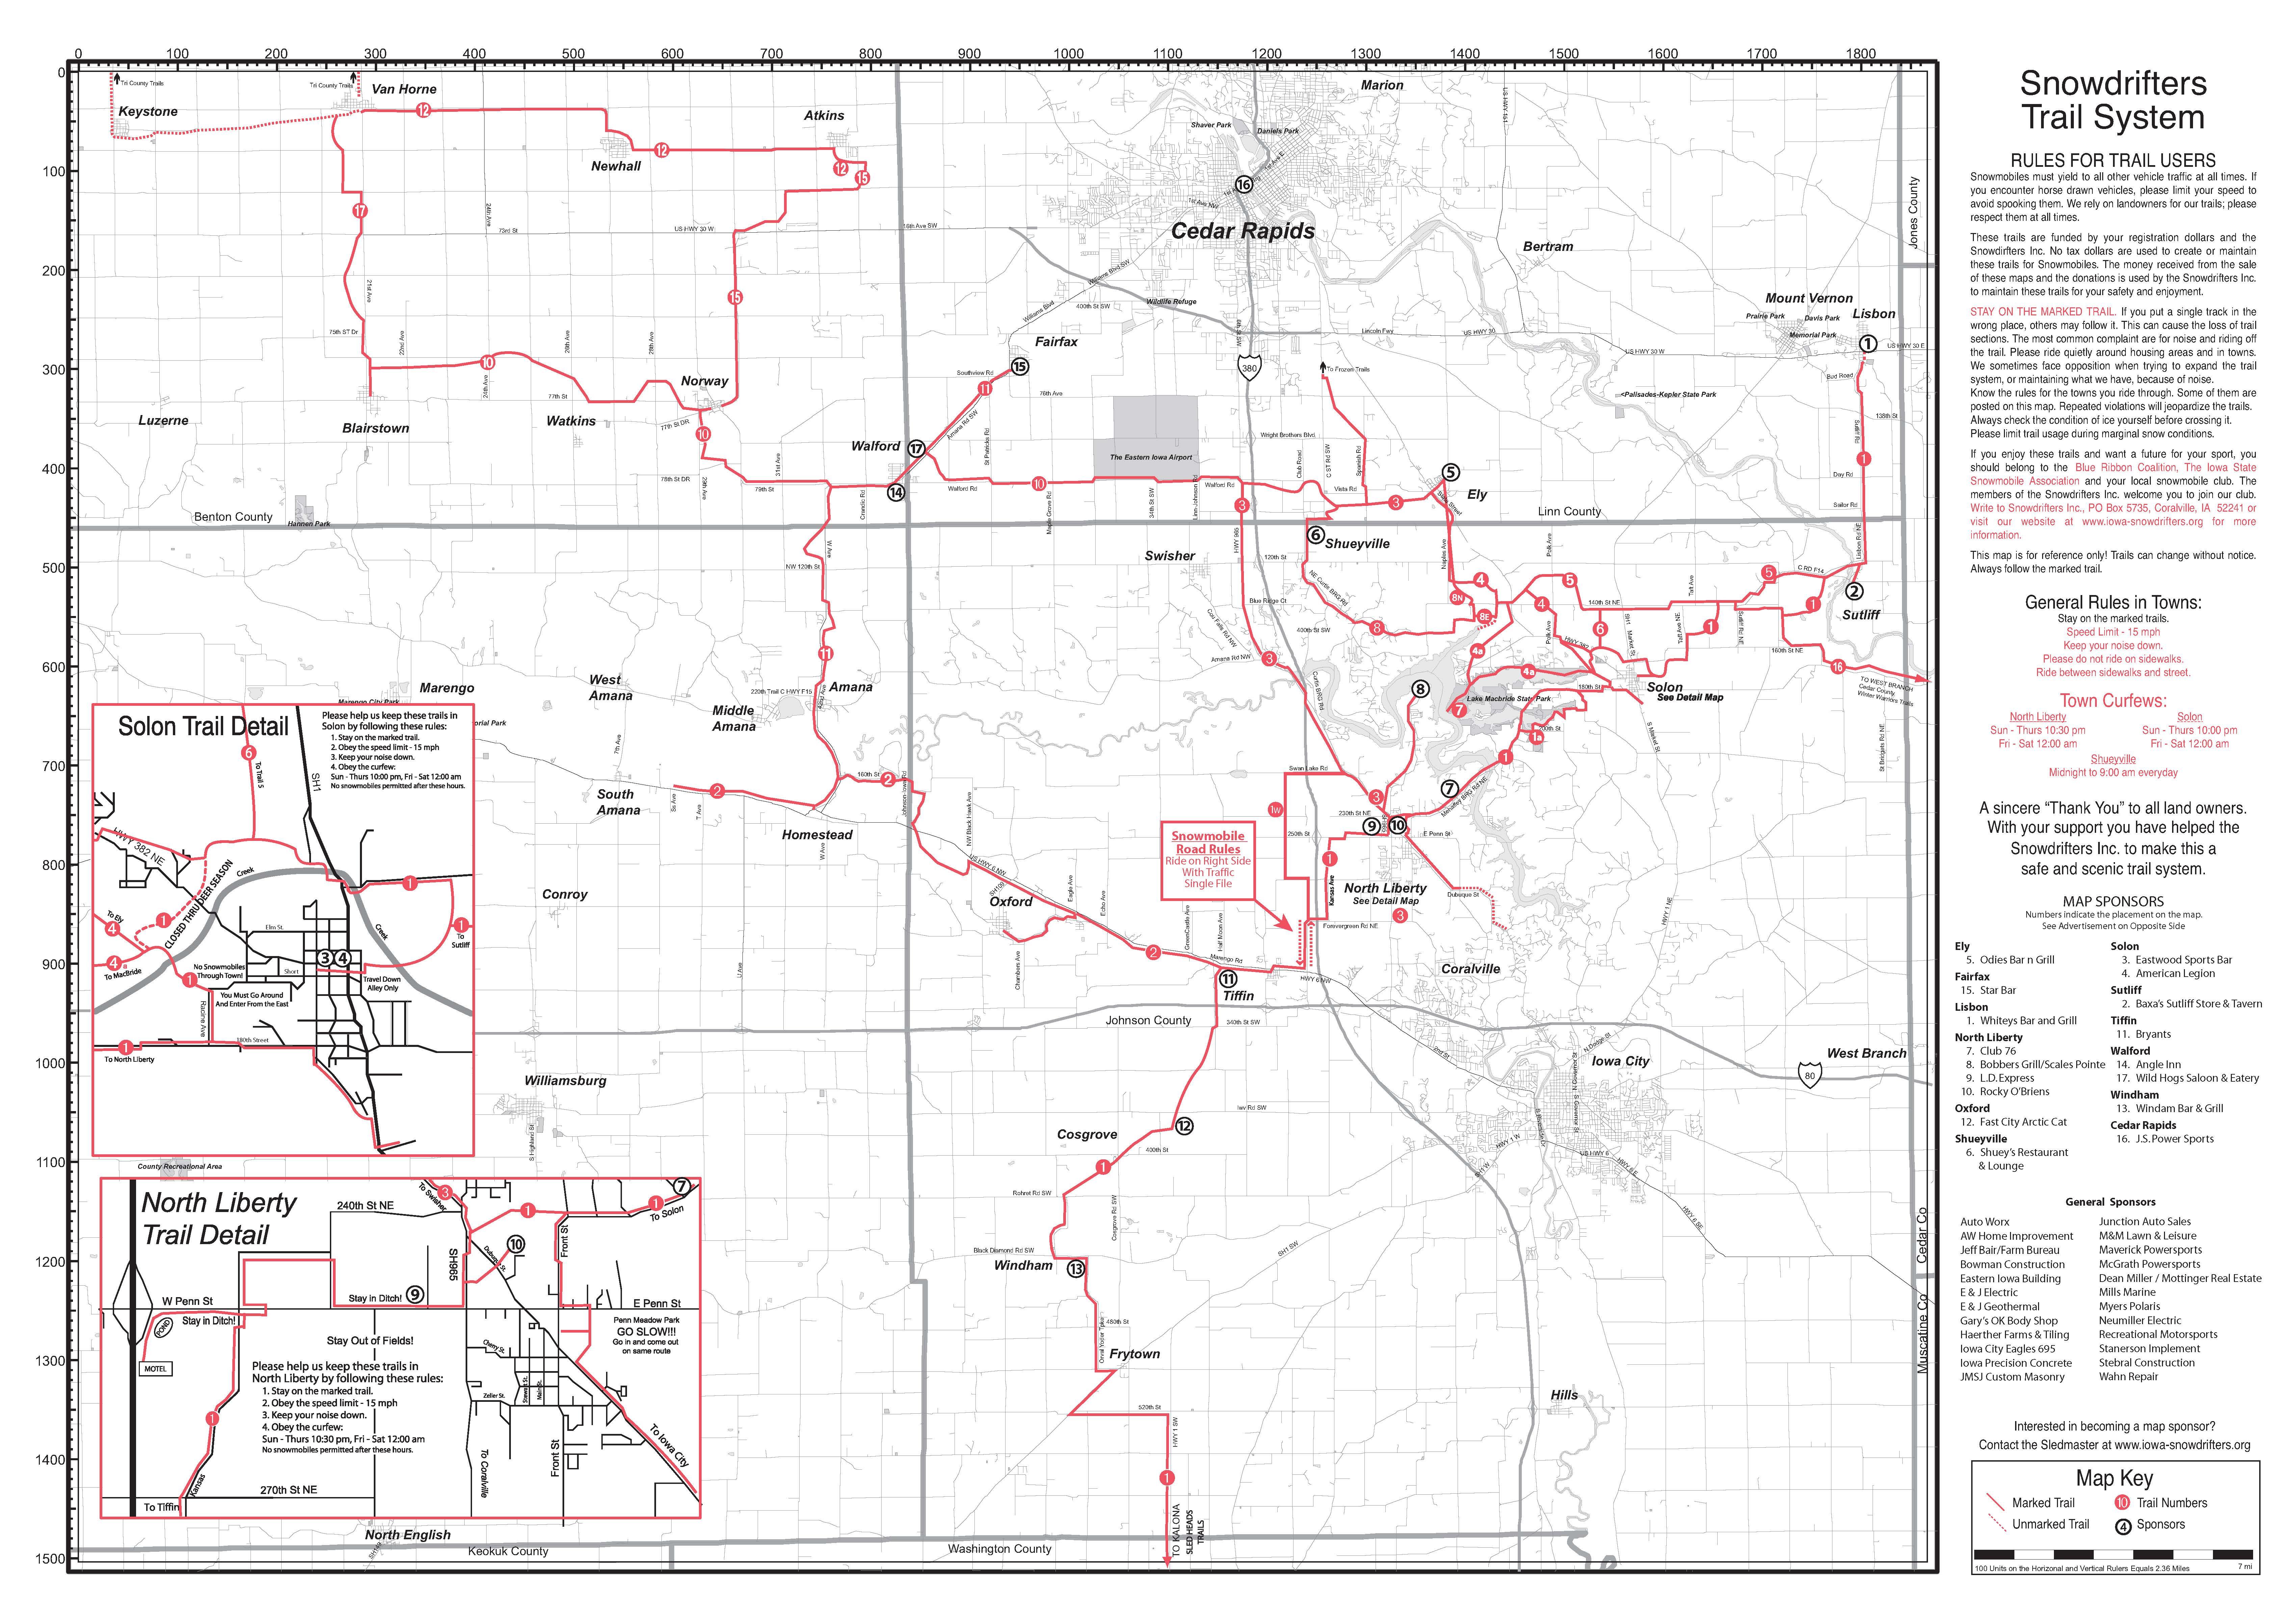 Trail Maps – Iowa Snowdrifters